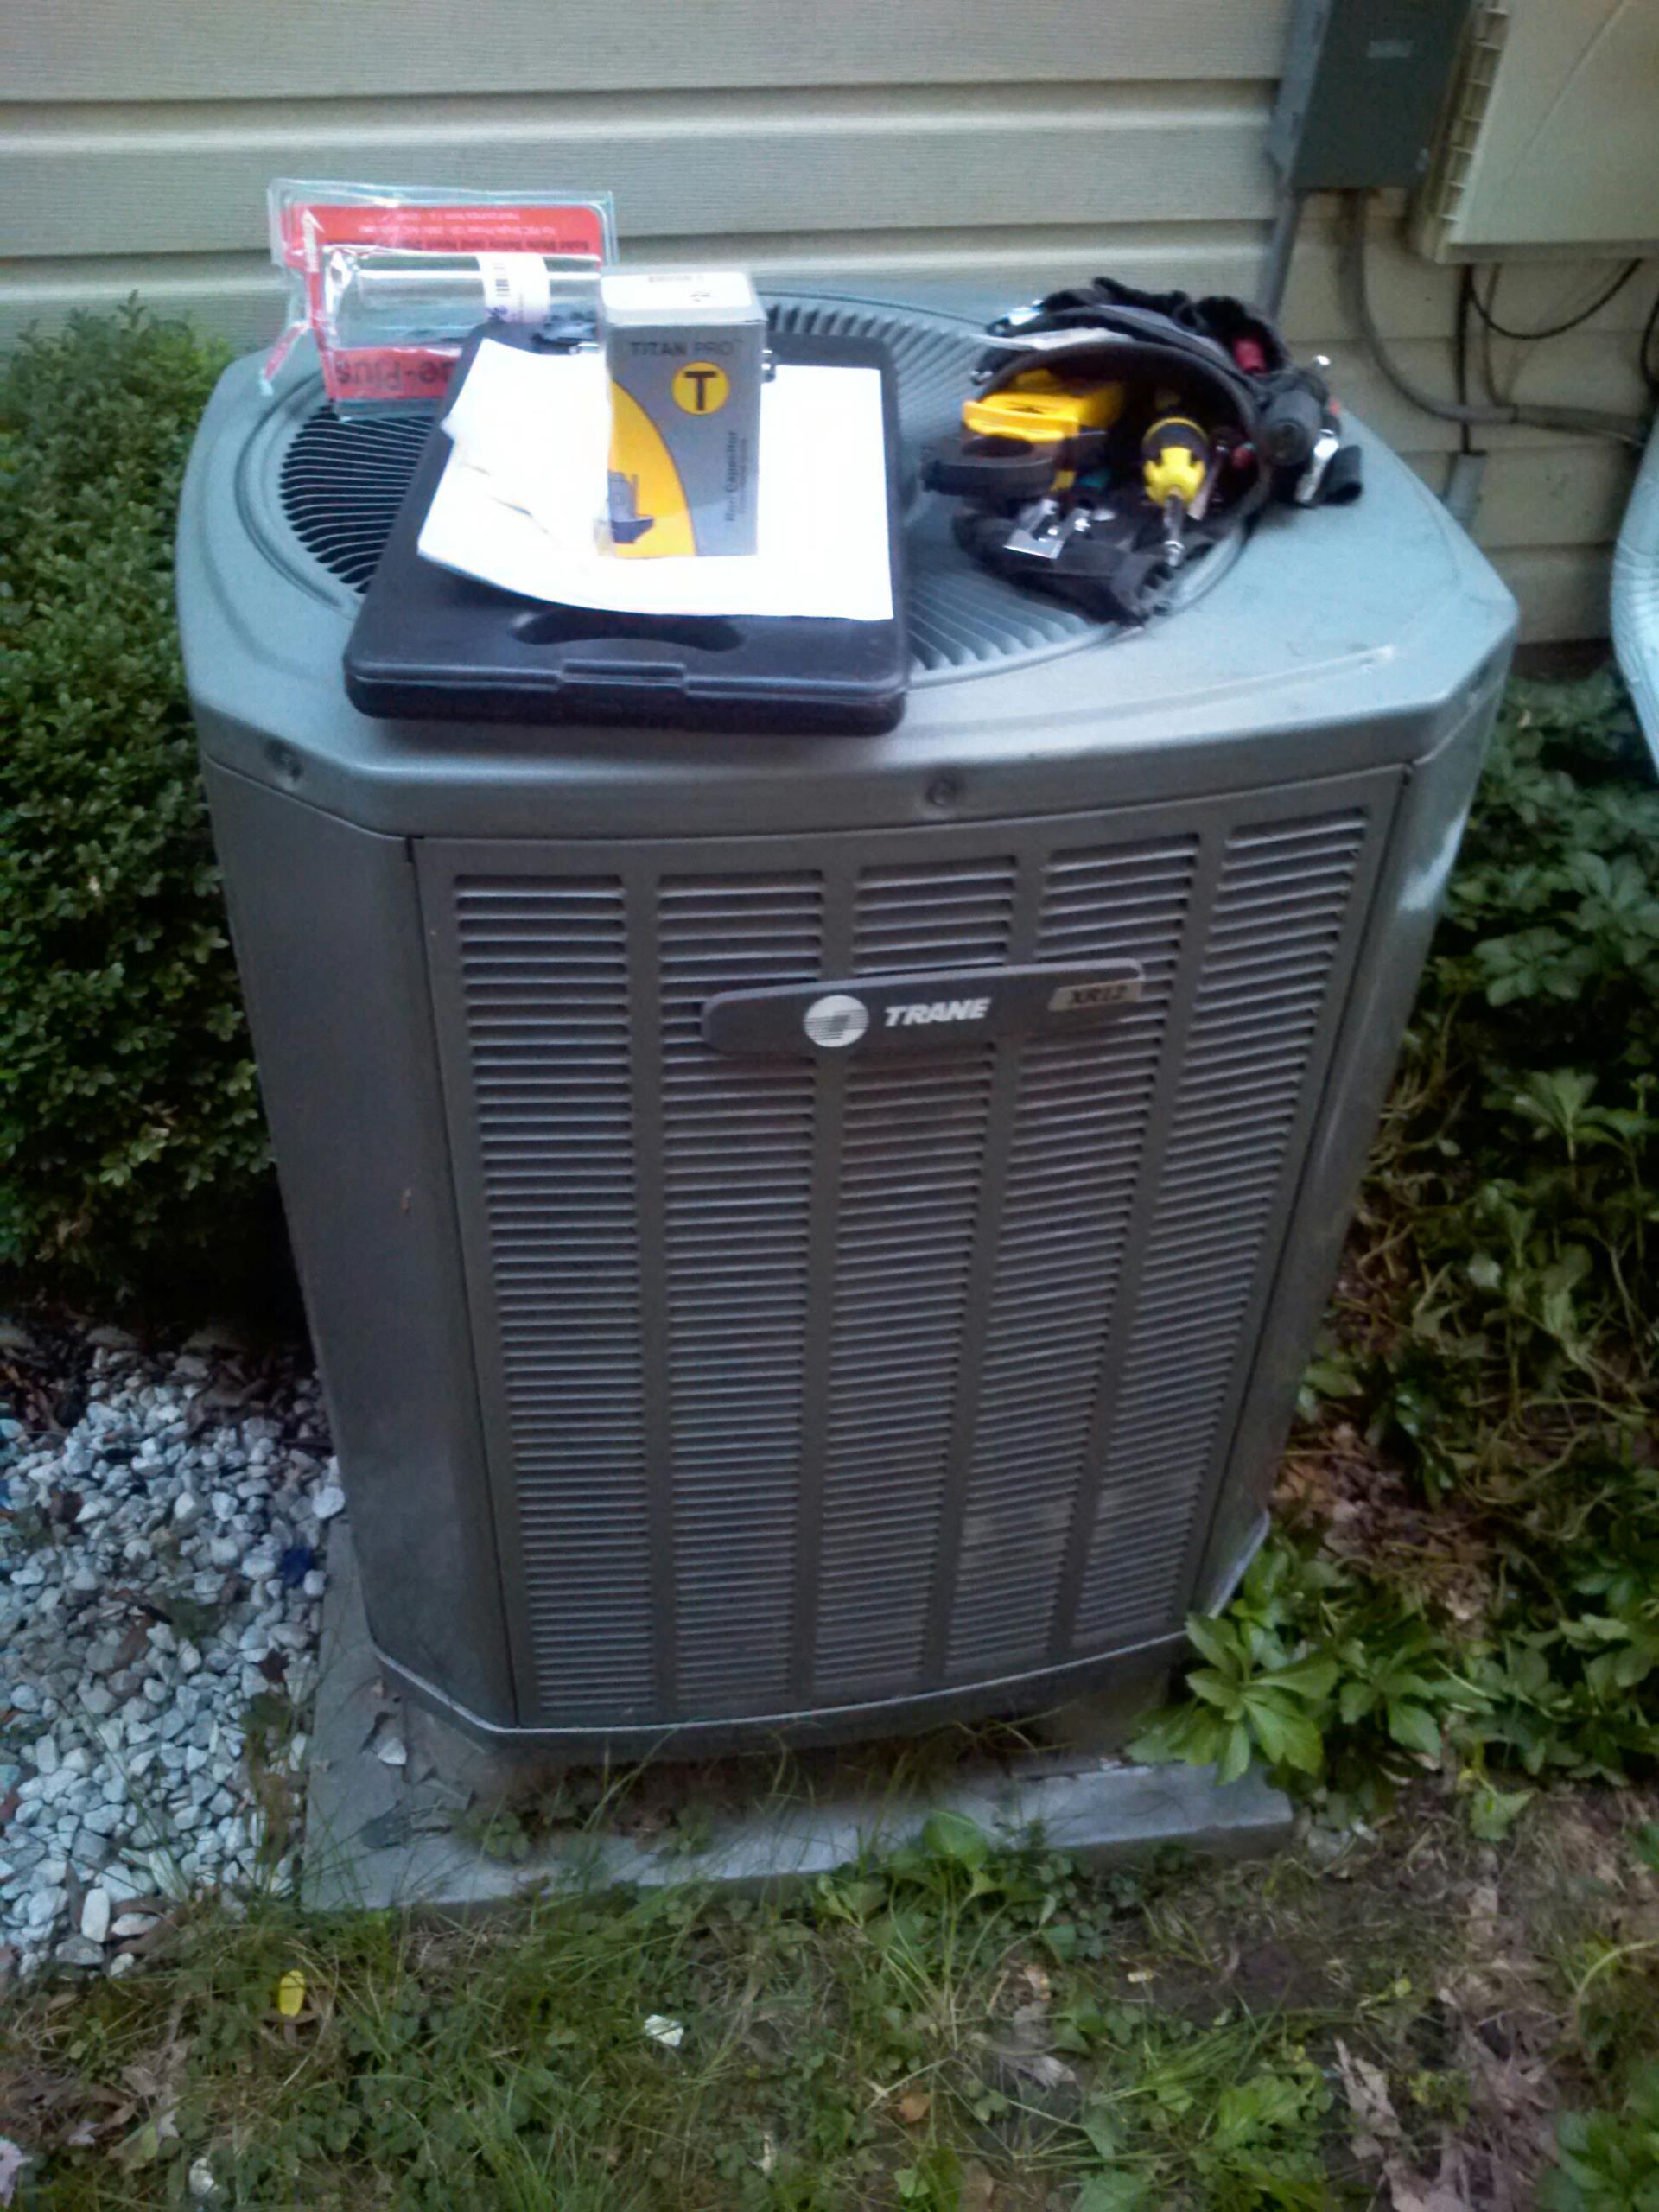 Crofton, MD - Trane heat pump heating & air conditioning system installation repair service call in Crofton Maryland 21114